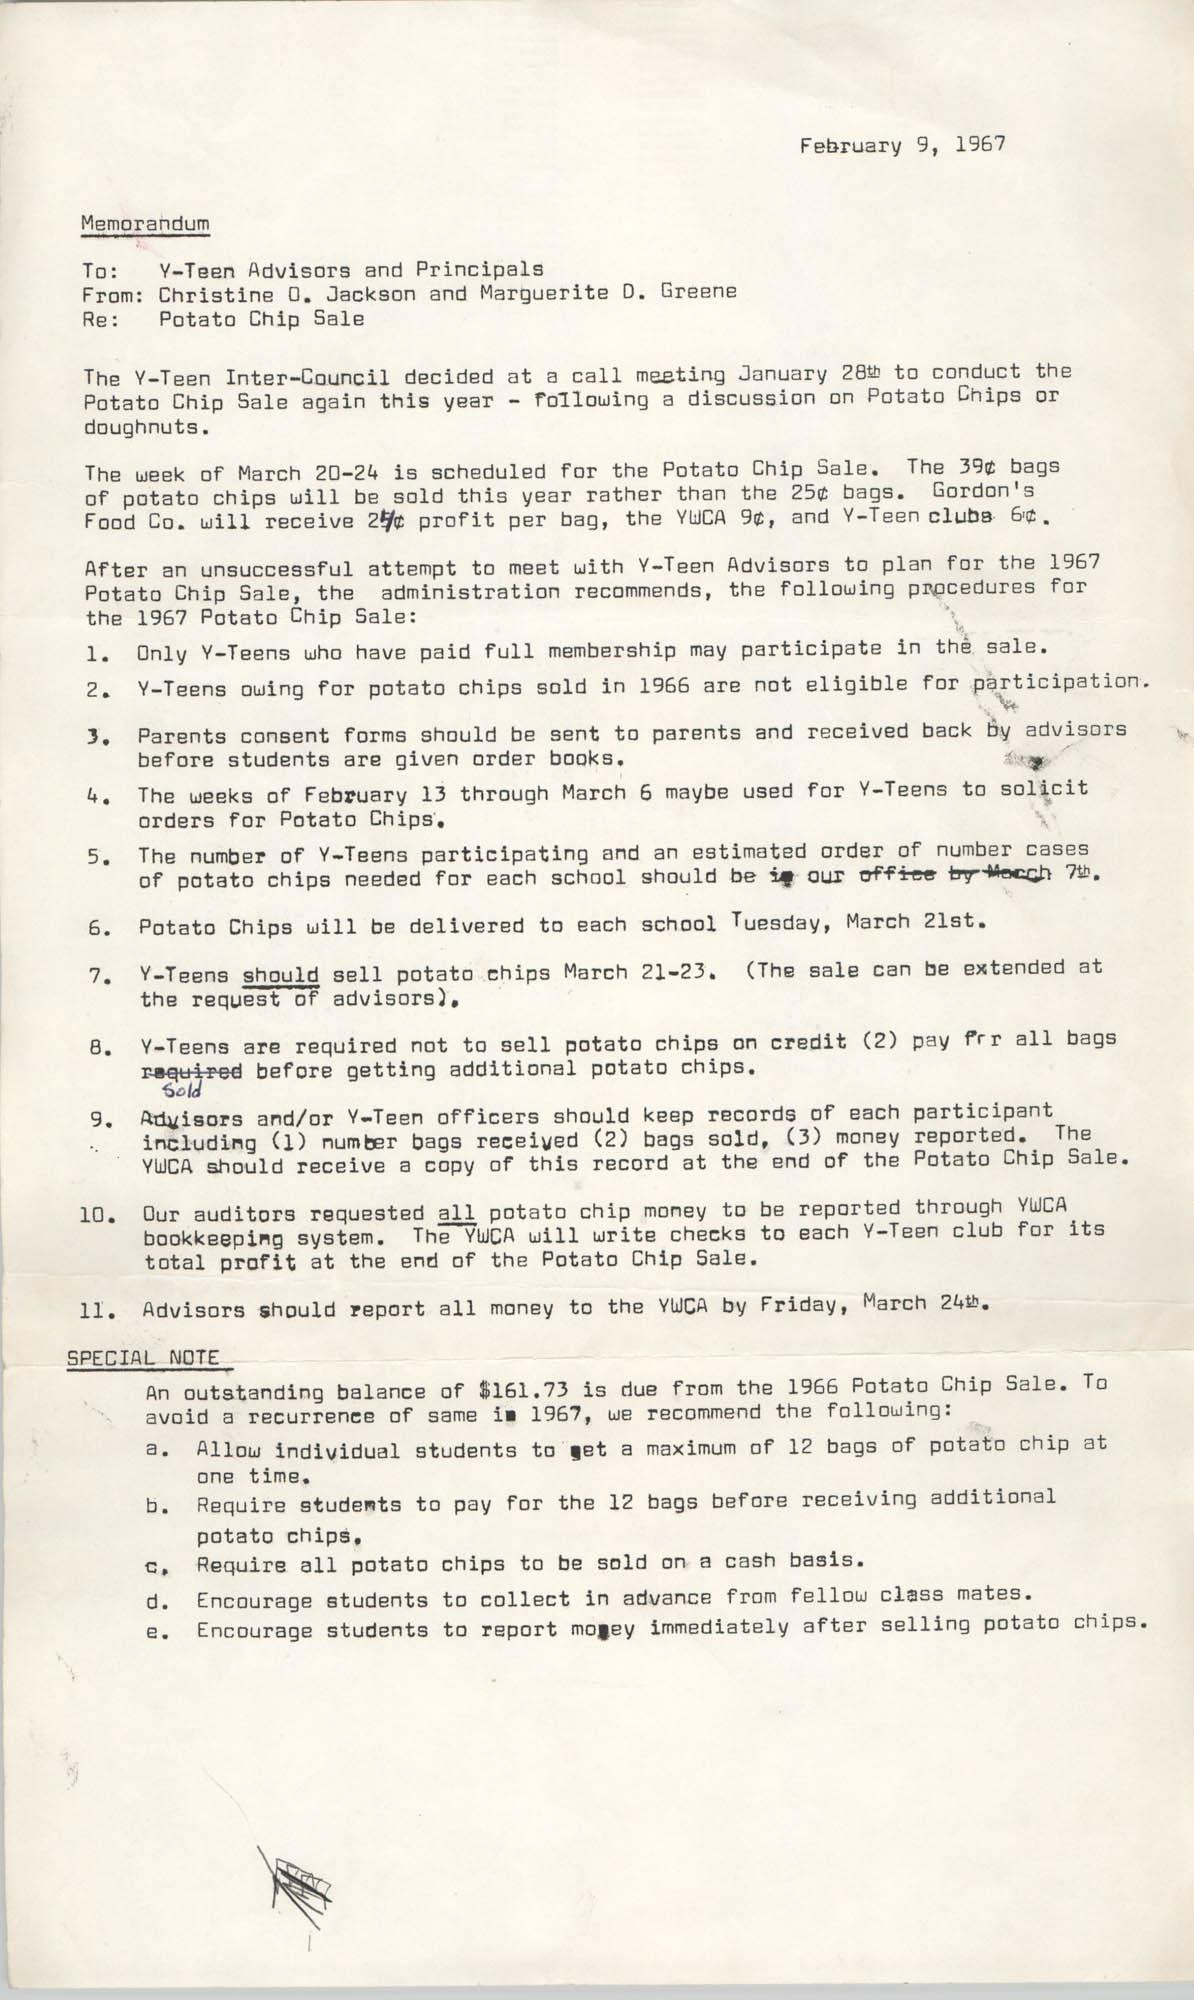 Coming Street Y.W.C.A. Memorandum, February 9, 1967